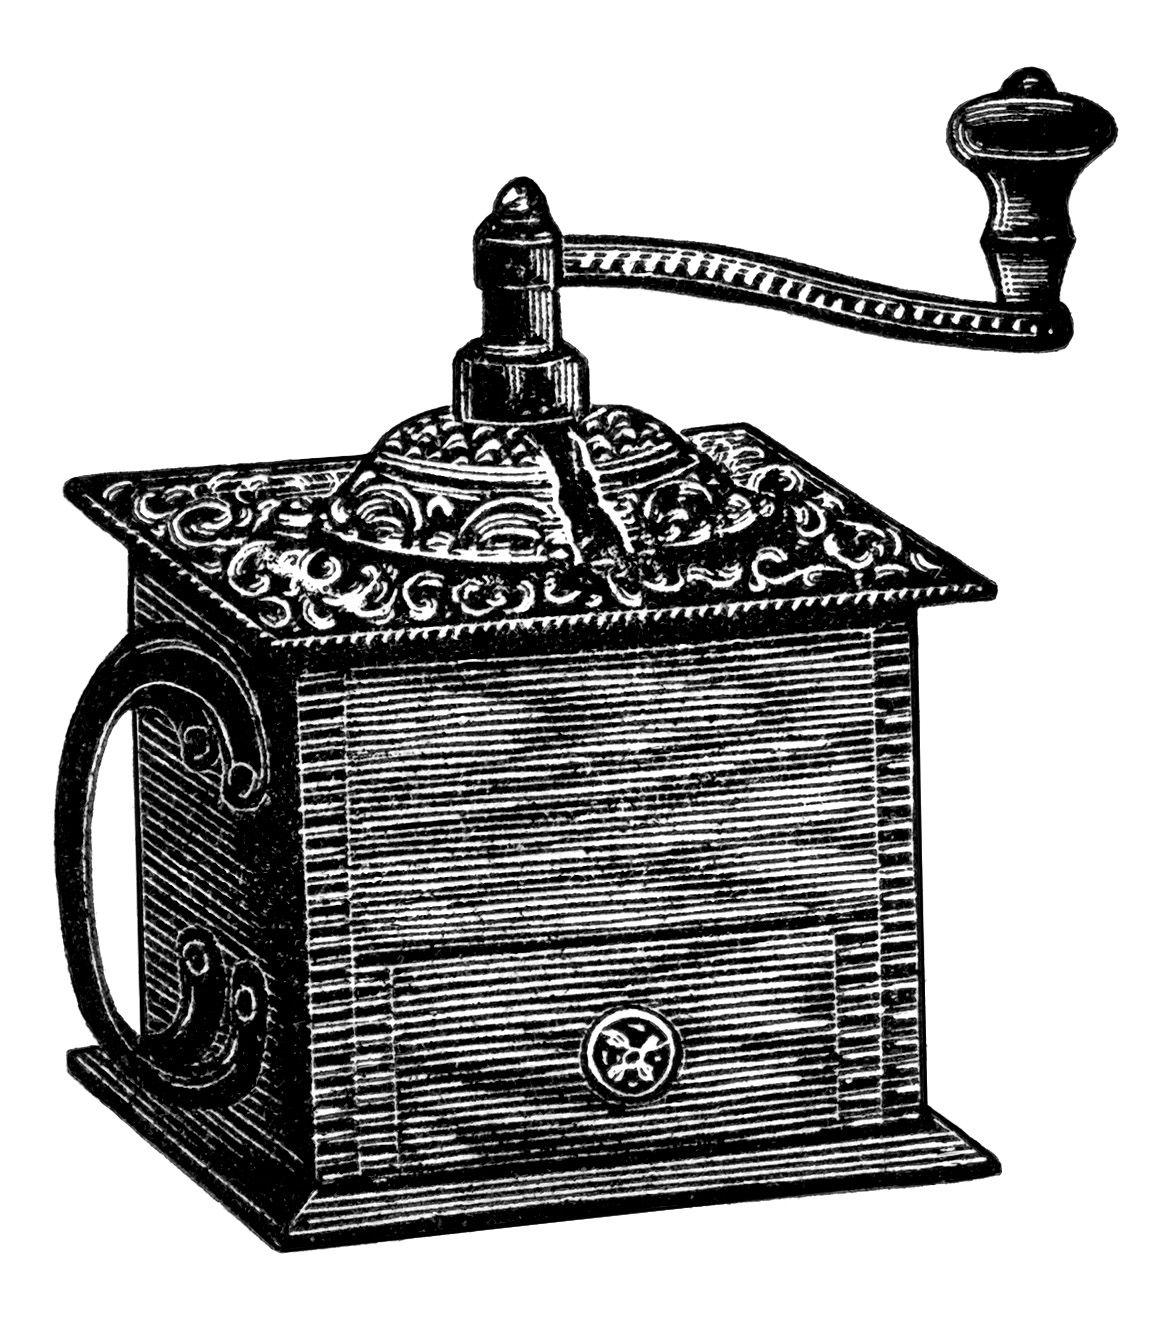 black and white clip art, enamel kettle illustration, vintage ...